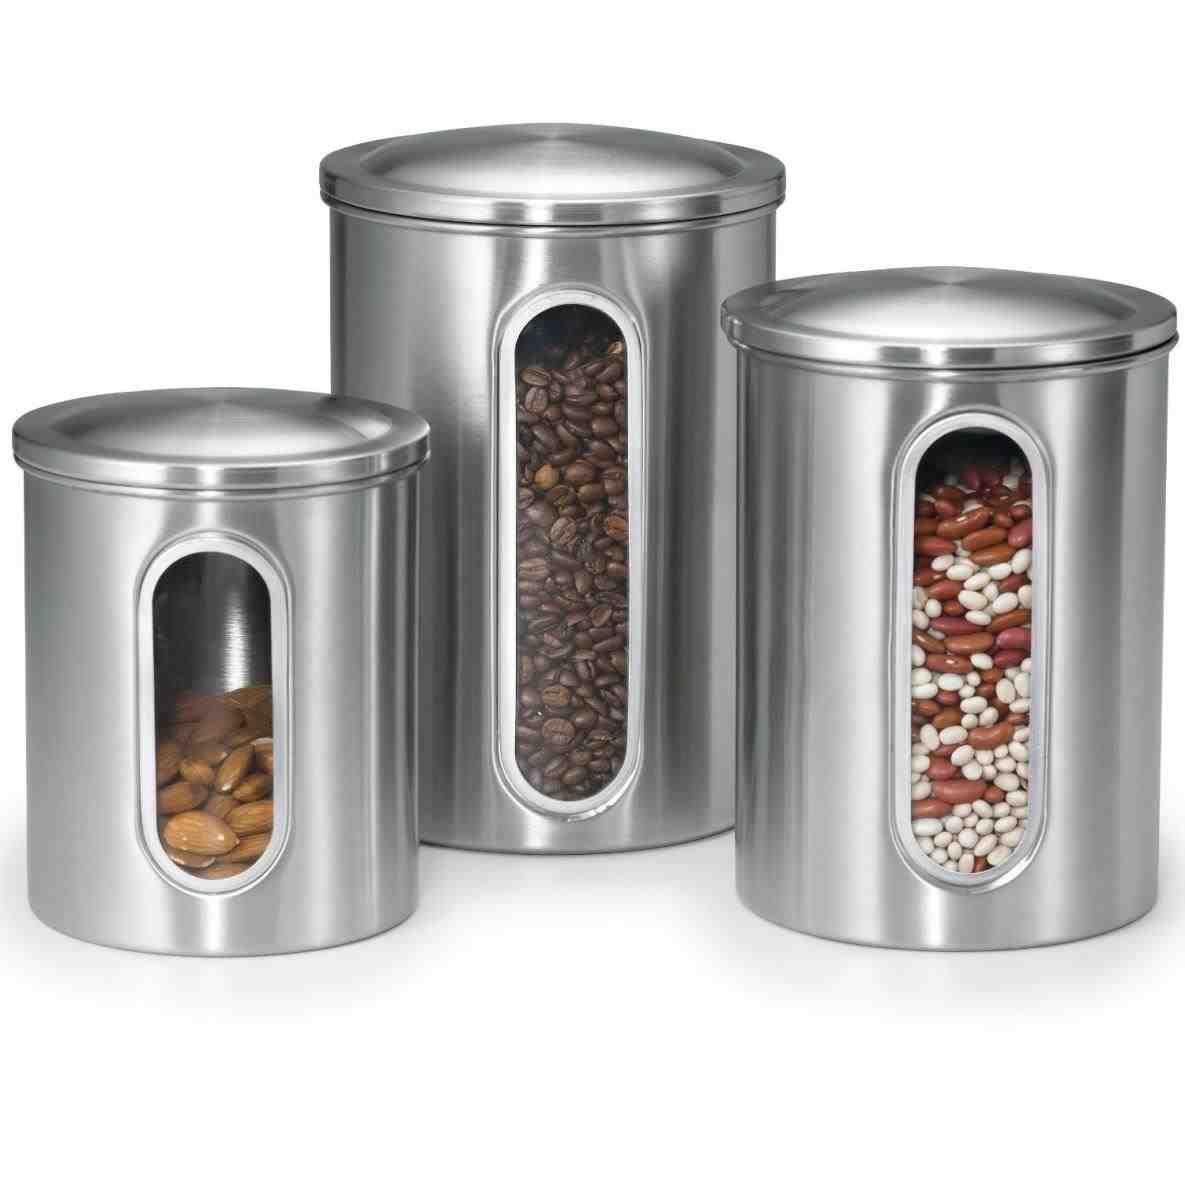 New cream tea coffee sugar jars at temasistemi home designs